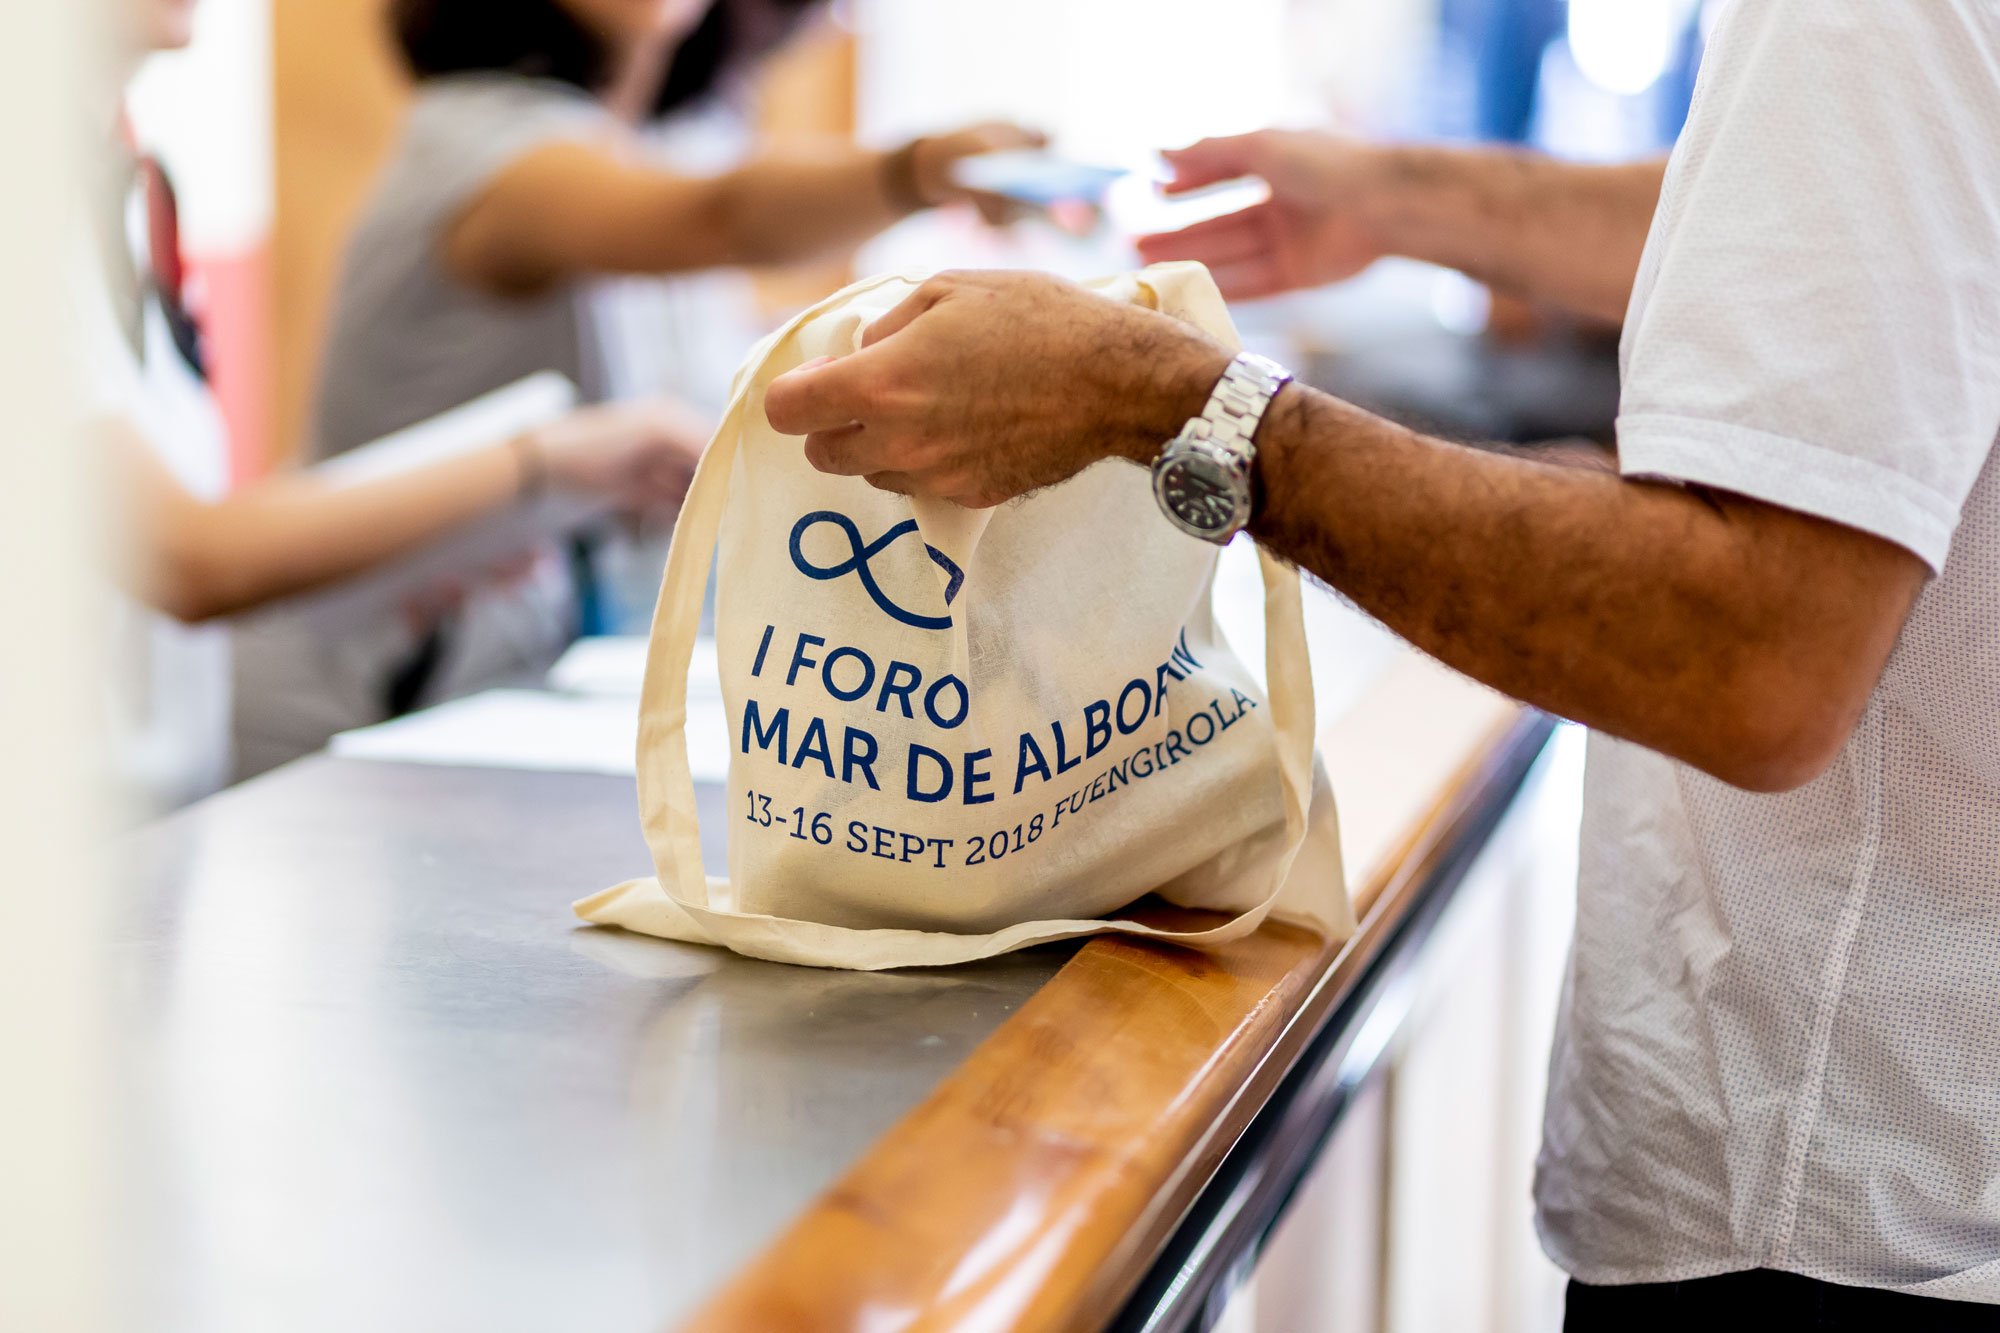 I Foro Mar de Alborán - Fans Marketing MÁLAGA